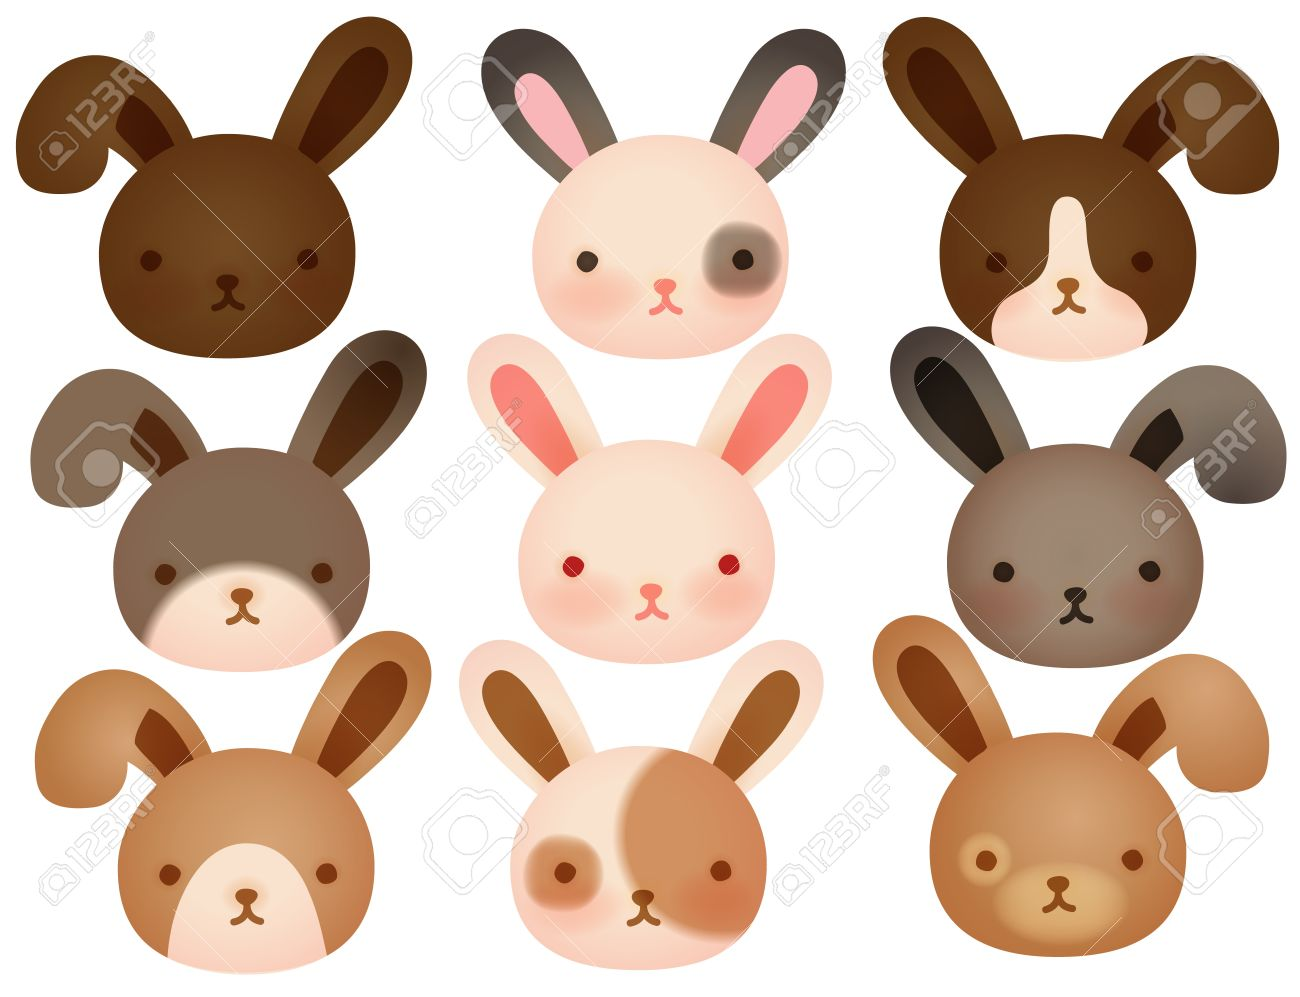 How To Draw A Cute Cartoon Bunny Rabbit New! Youtube